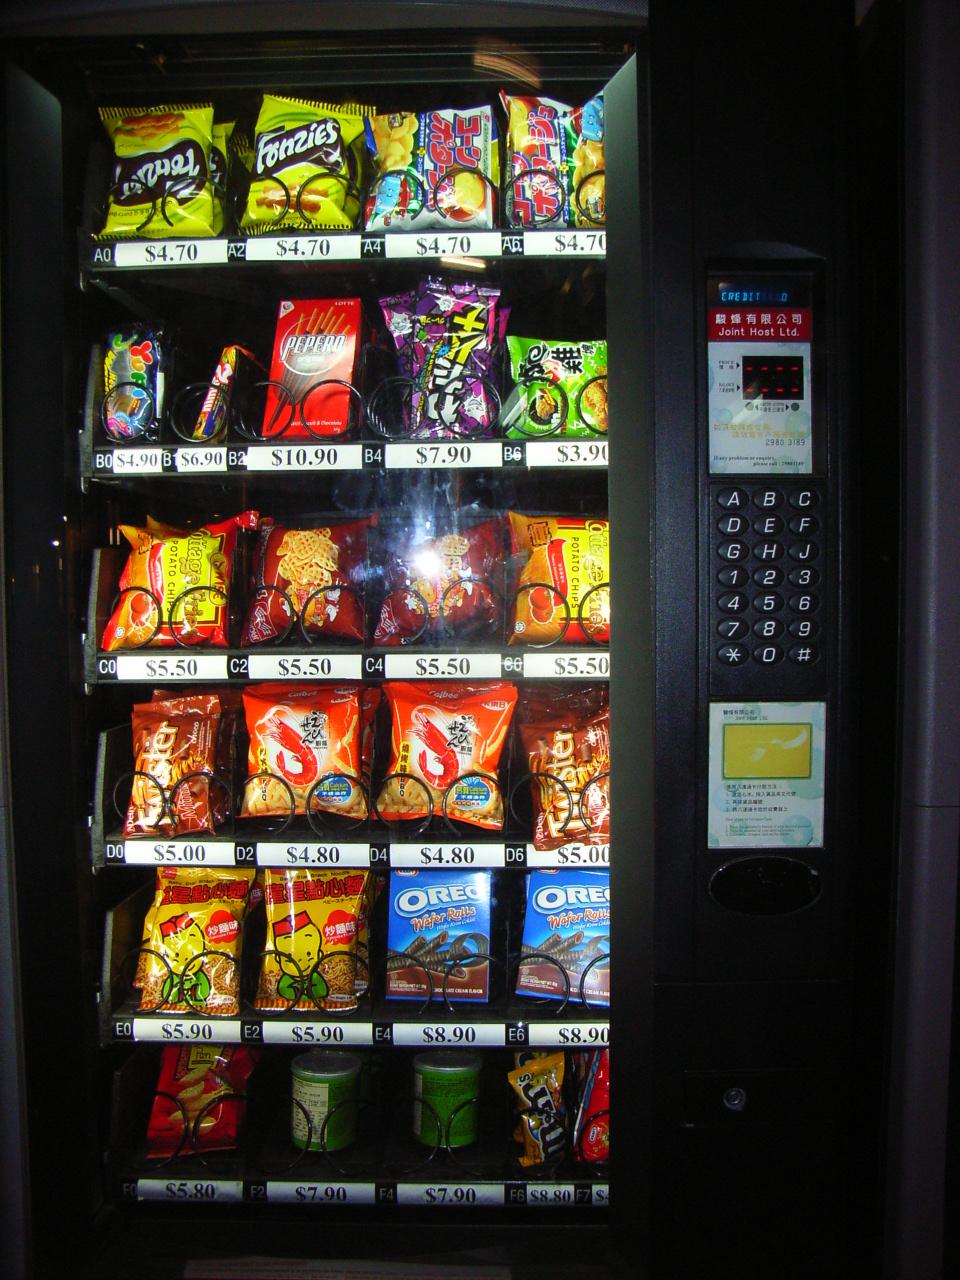 Hd Hot Dog Vending Machine